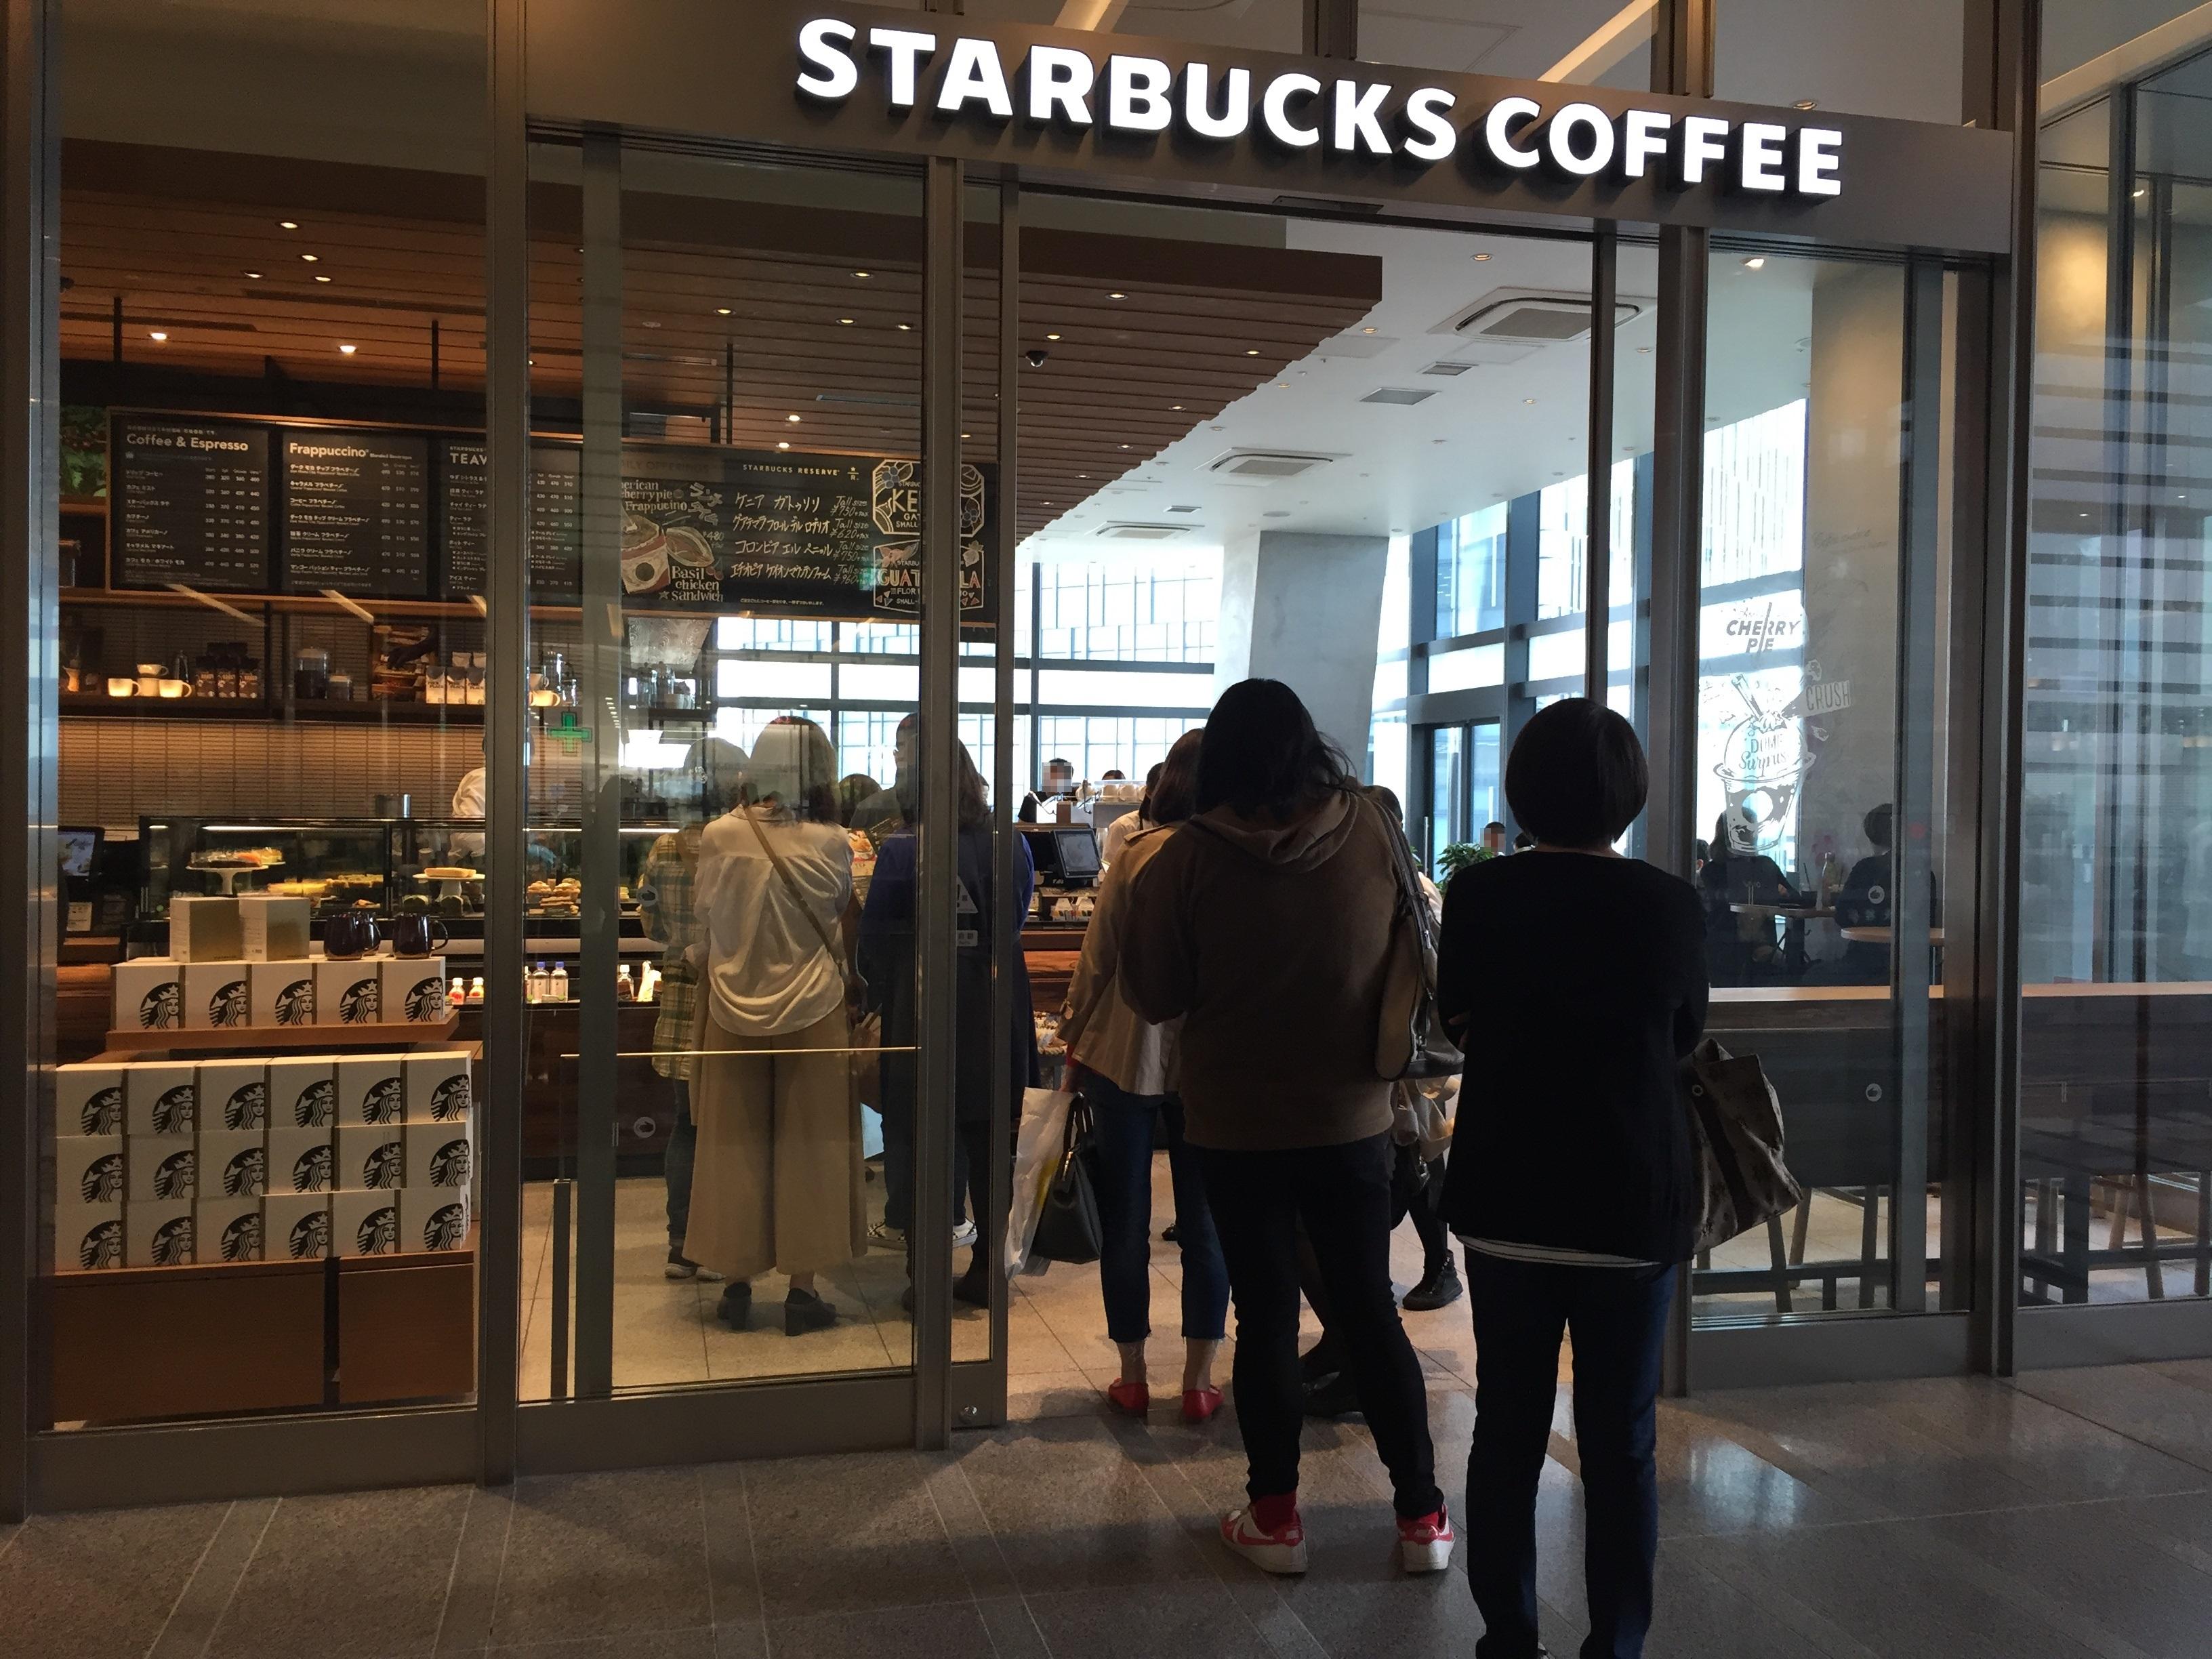 jrgatetower-starbucks-coffee